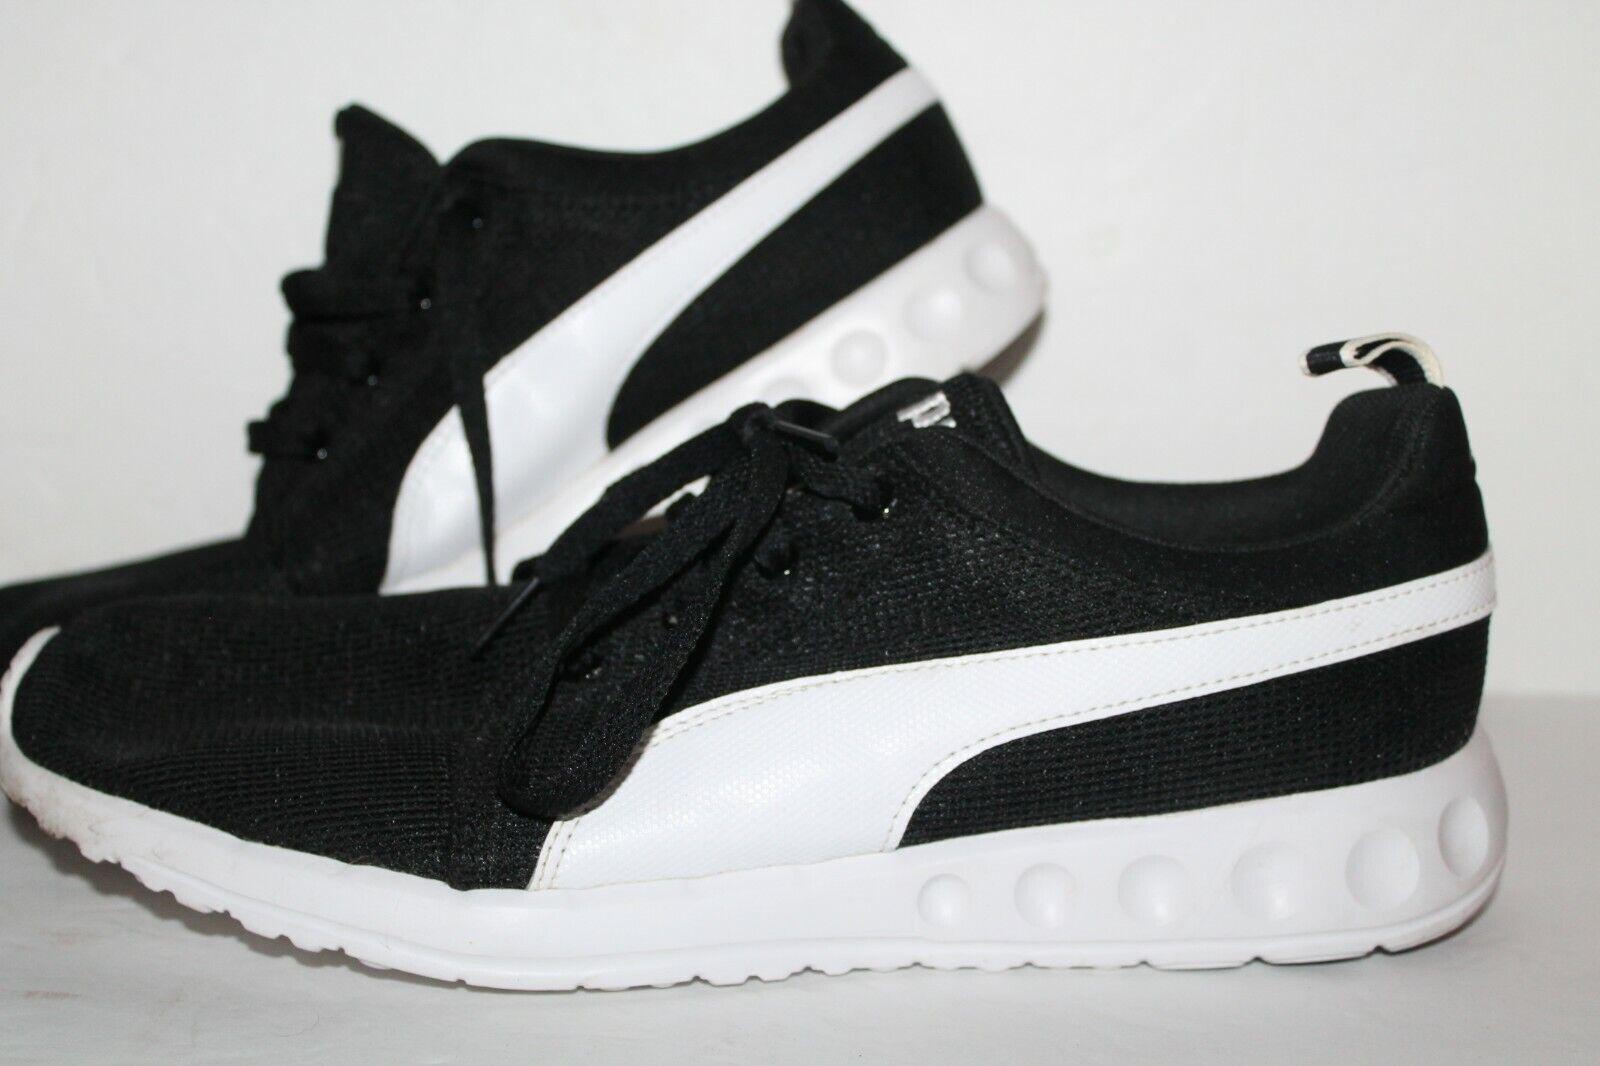 PUMA Carson Runner Sneaker Shoes Black